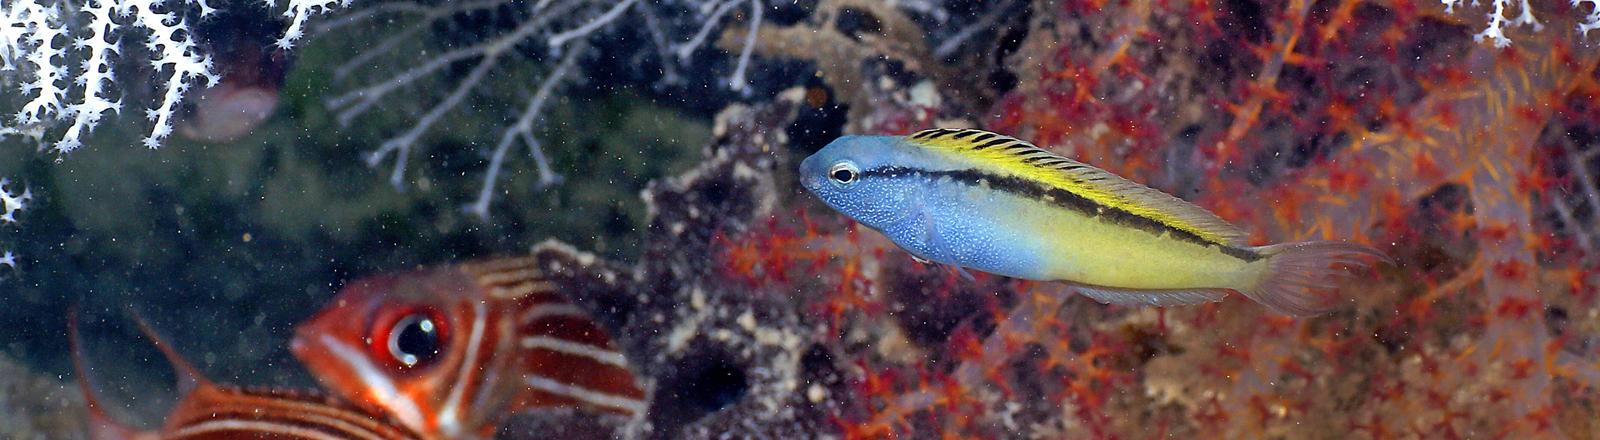 Unterwasser-Szene mit Meiacanthus nigrolineatus